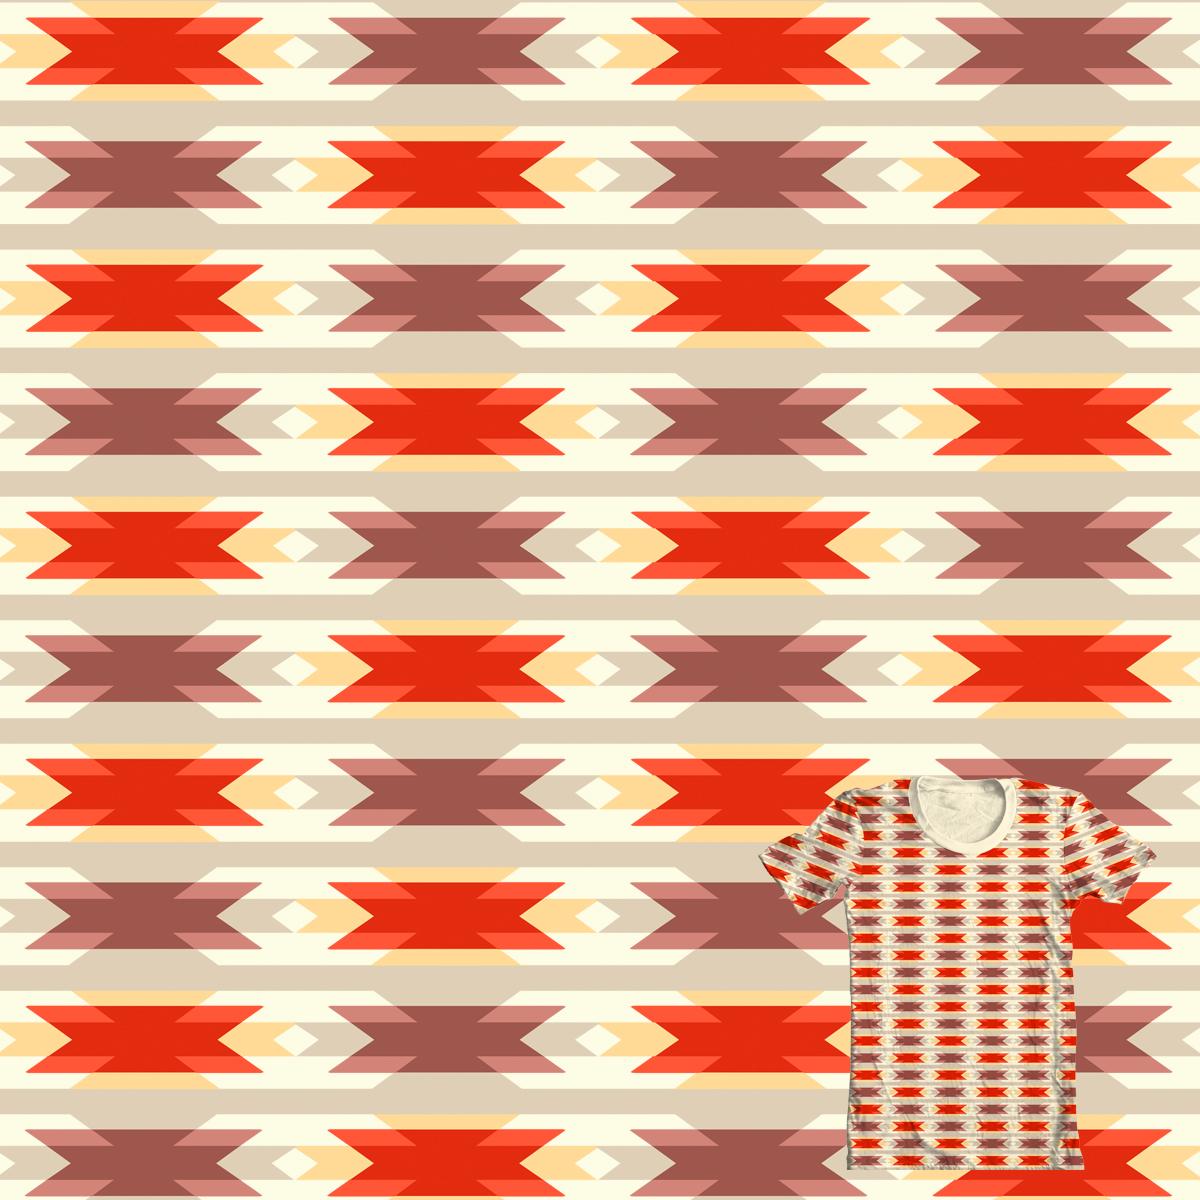 Sunstone by Evan_Luza on Threadless